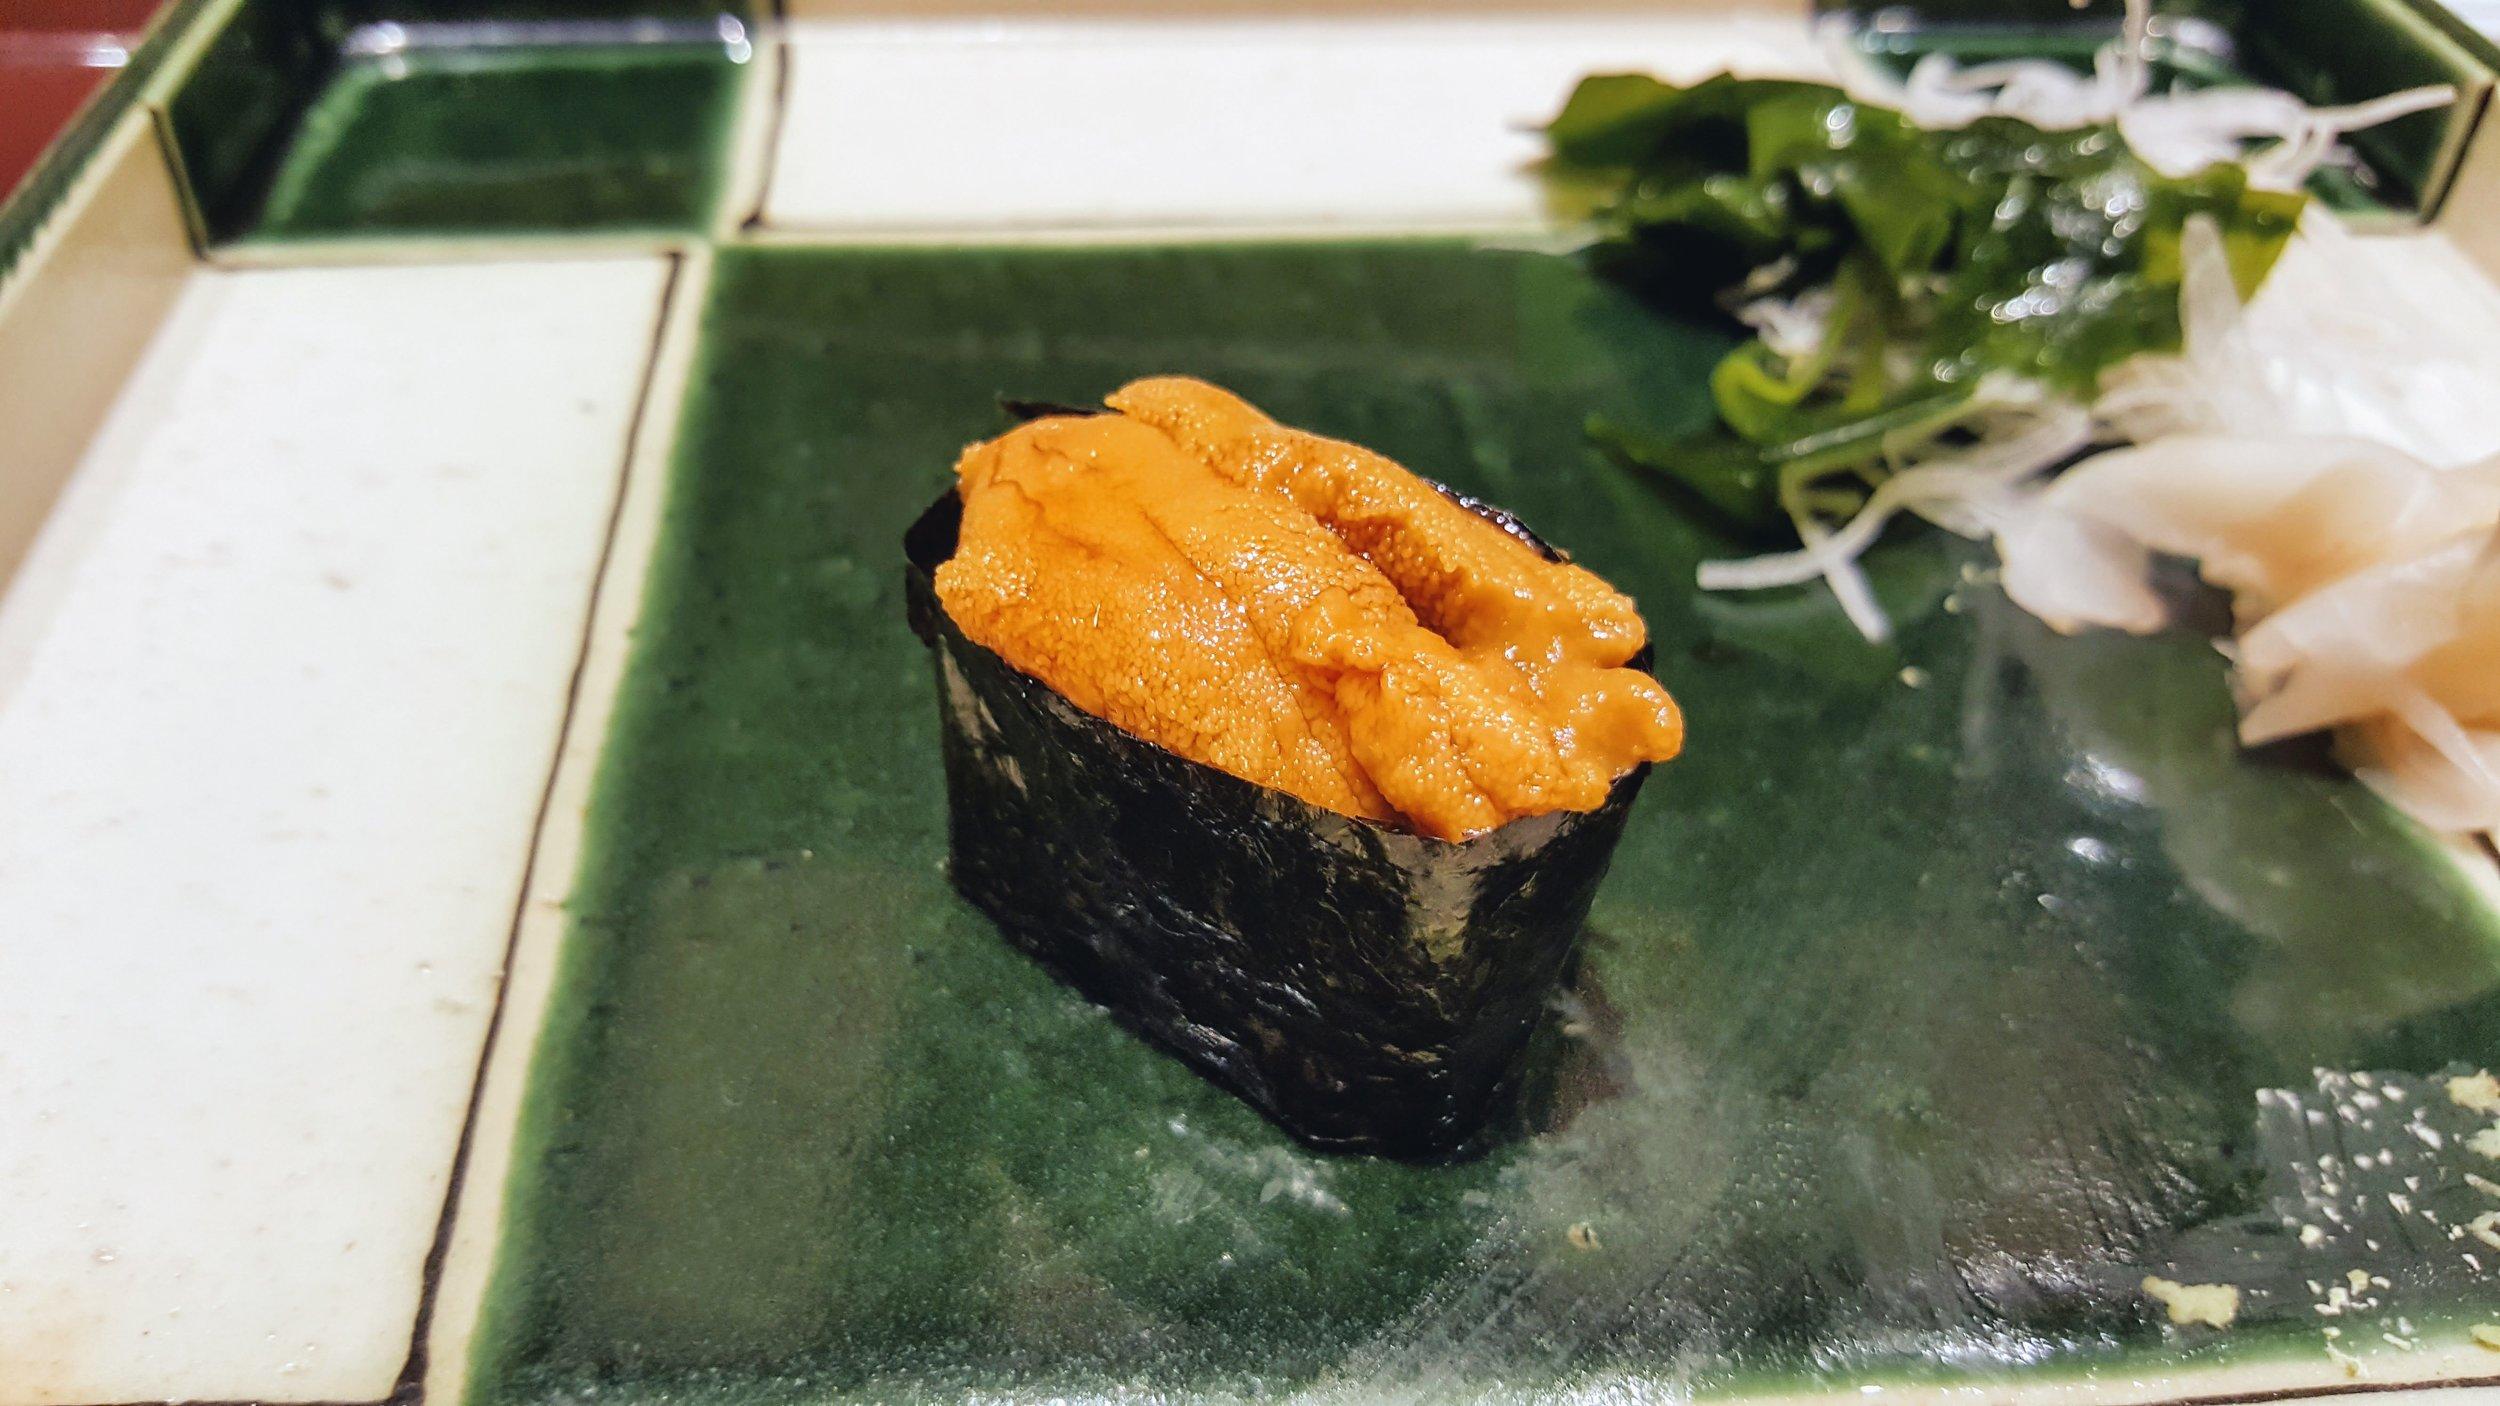 Love the sea urchin, so fresh and creamy.